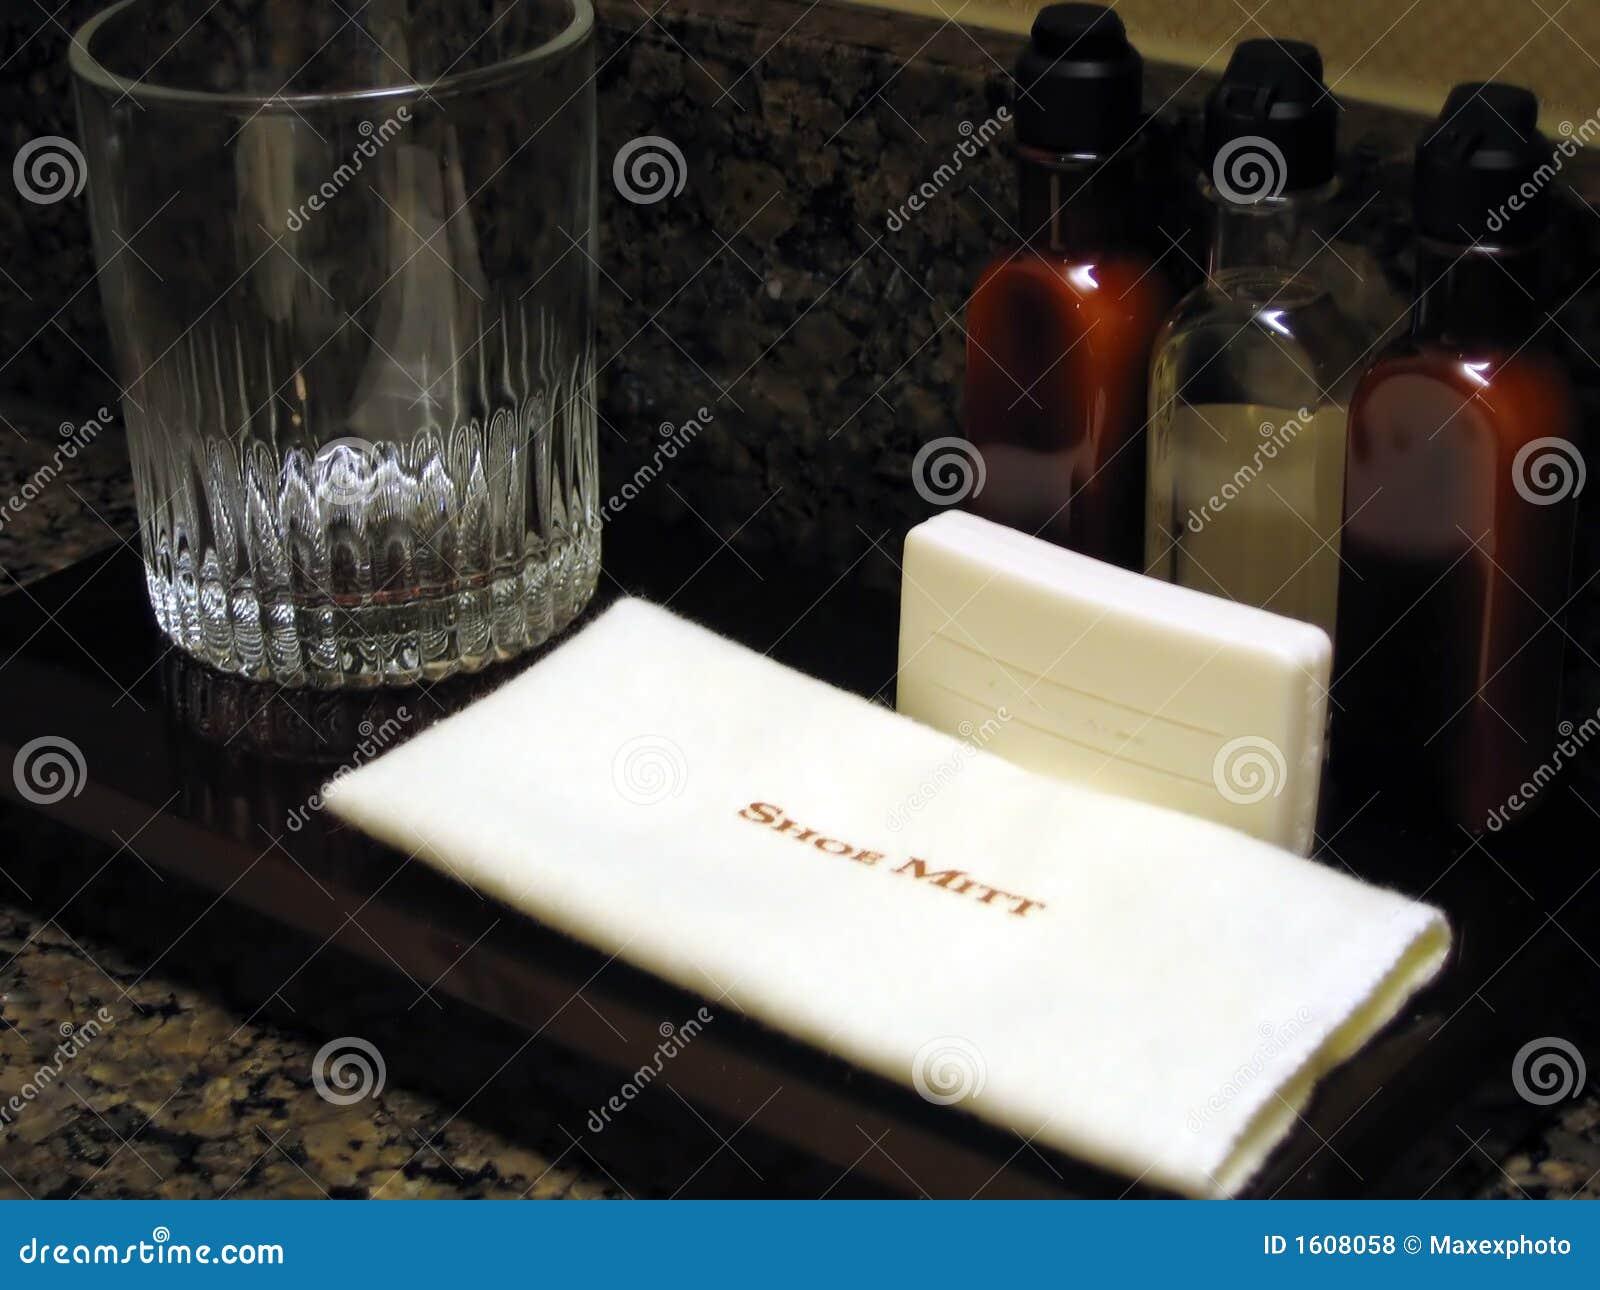 Hotel Room Bathroom Amenities. Hotel Room Bathroom Amenities Royalty Free Stock Photos   Image